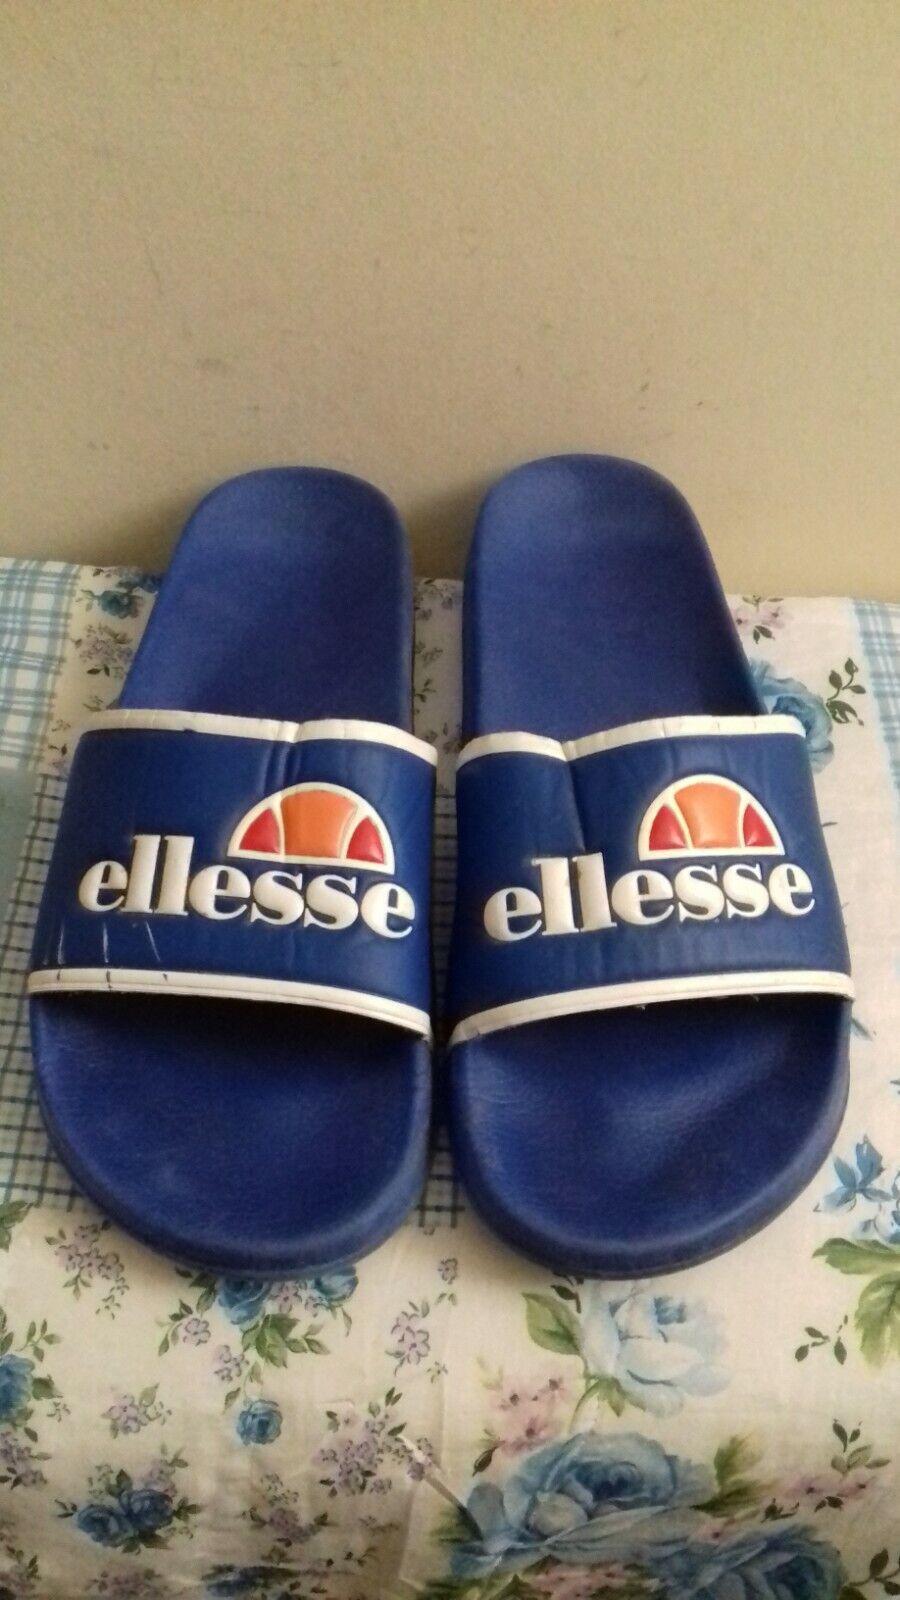 ELLESSE - DUKE Logo Sliders, Sandals, Blue Size UK 9 EU 43